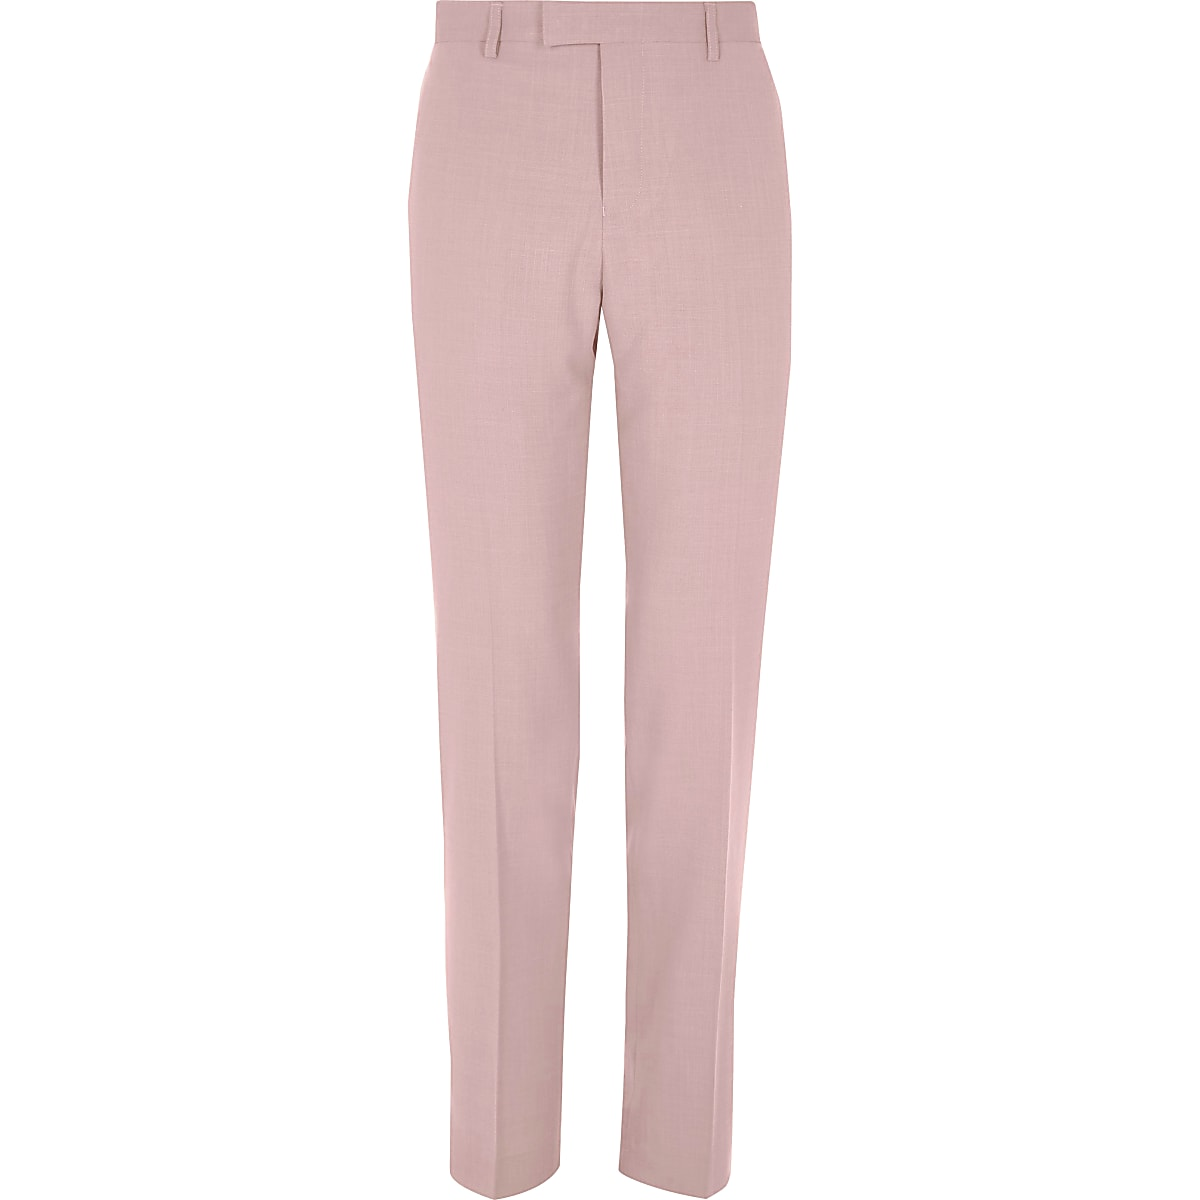 Pink slim fit suit trousers